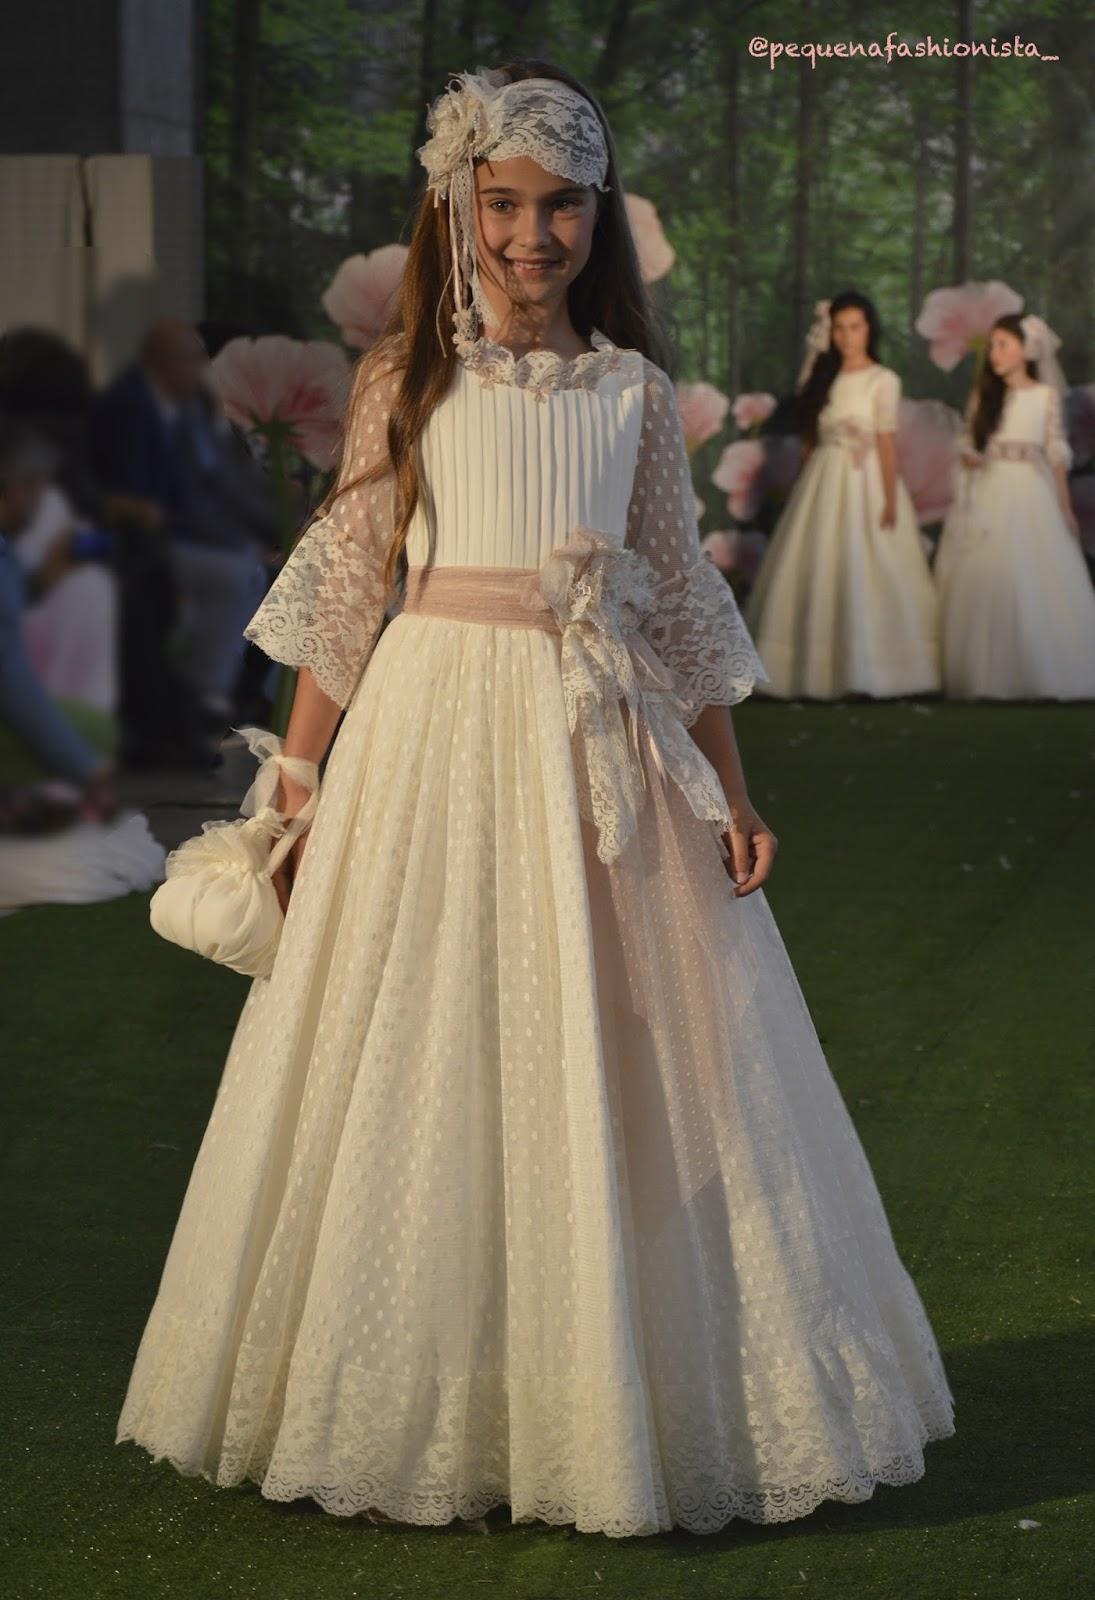 Vestidos comunion tendencia 2019